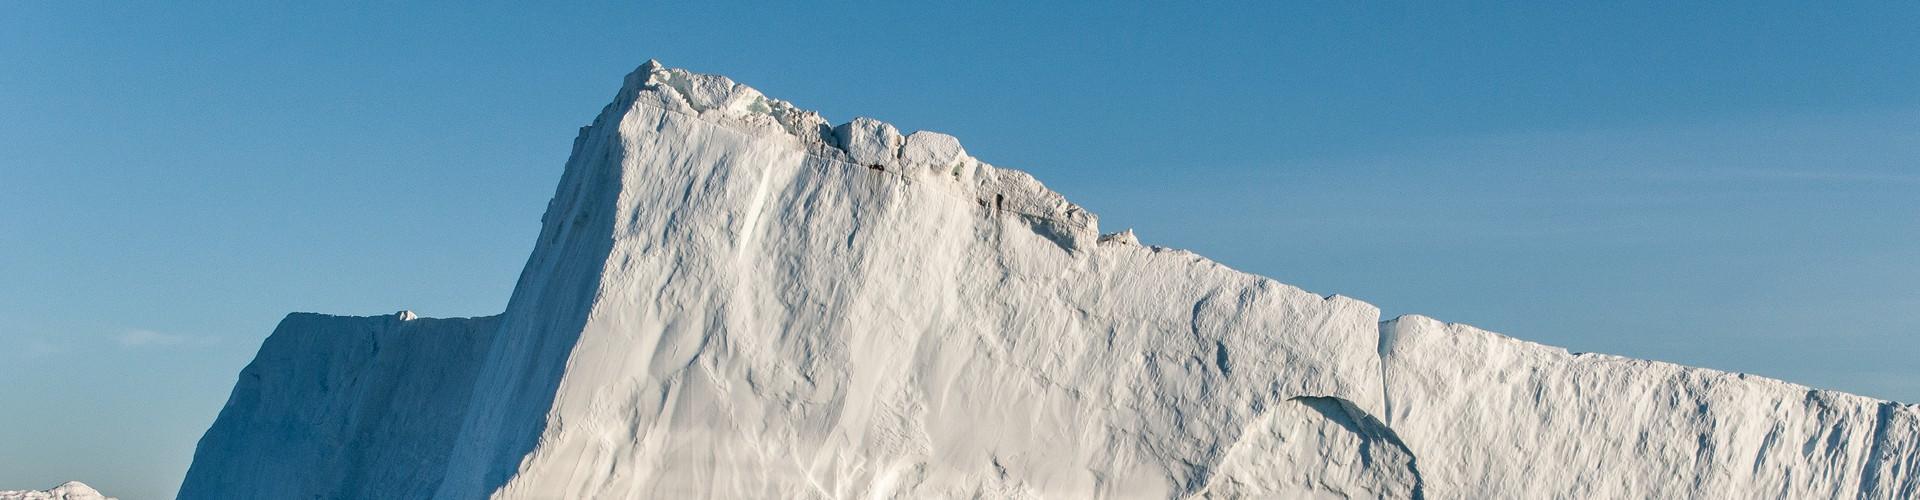 Iceberg from Jakobshavn Isbræ, Disko Bay (Credit: Ian Joughin, PSC/APL/UW)